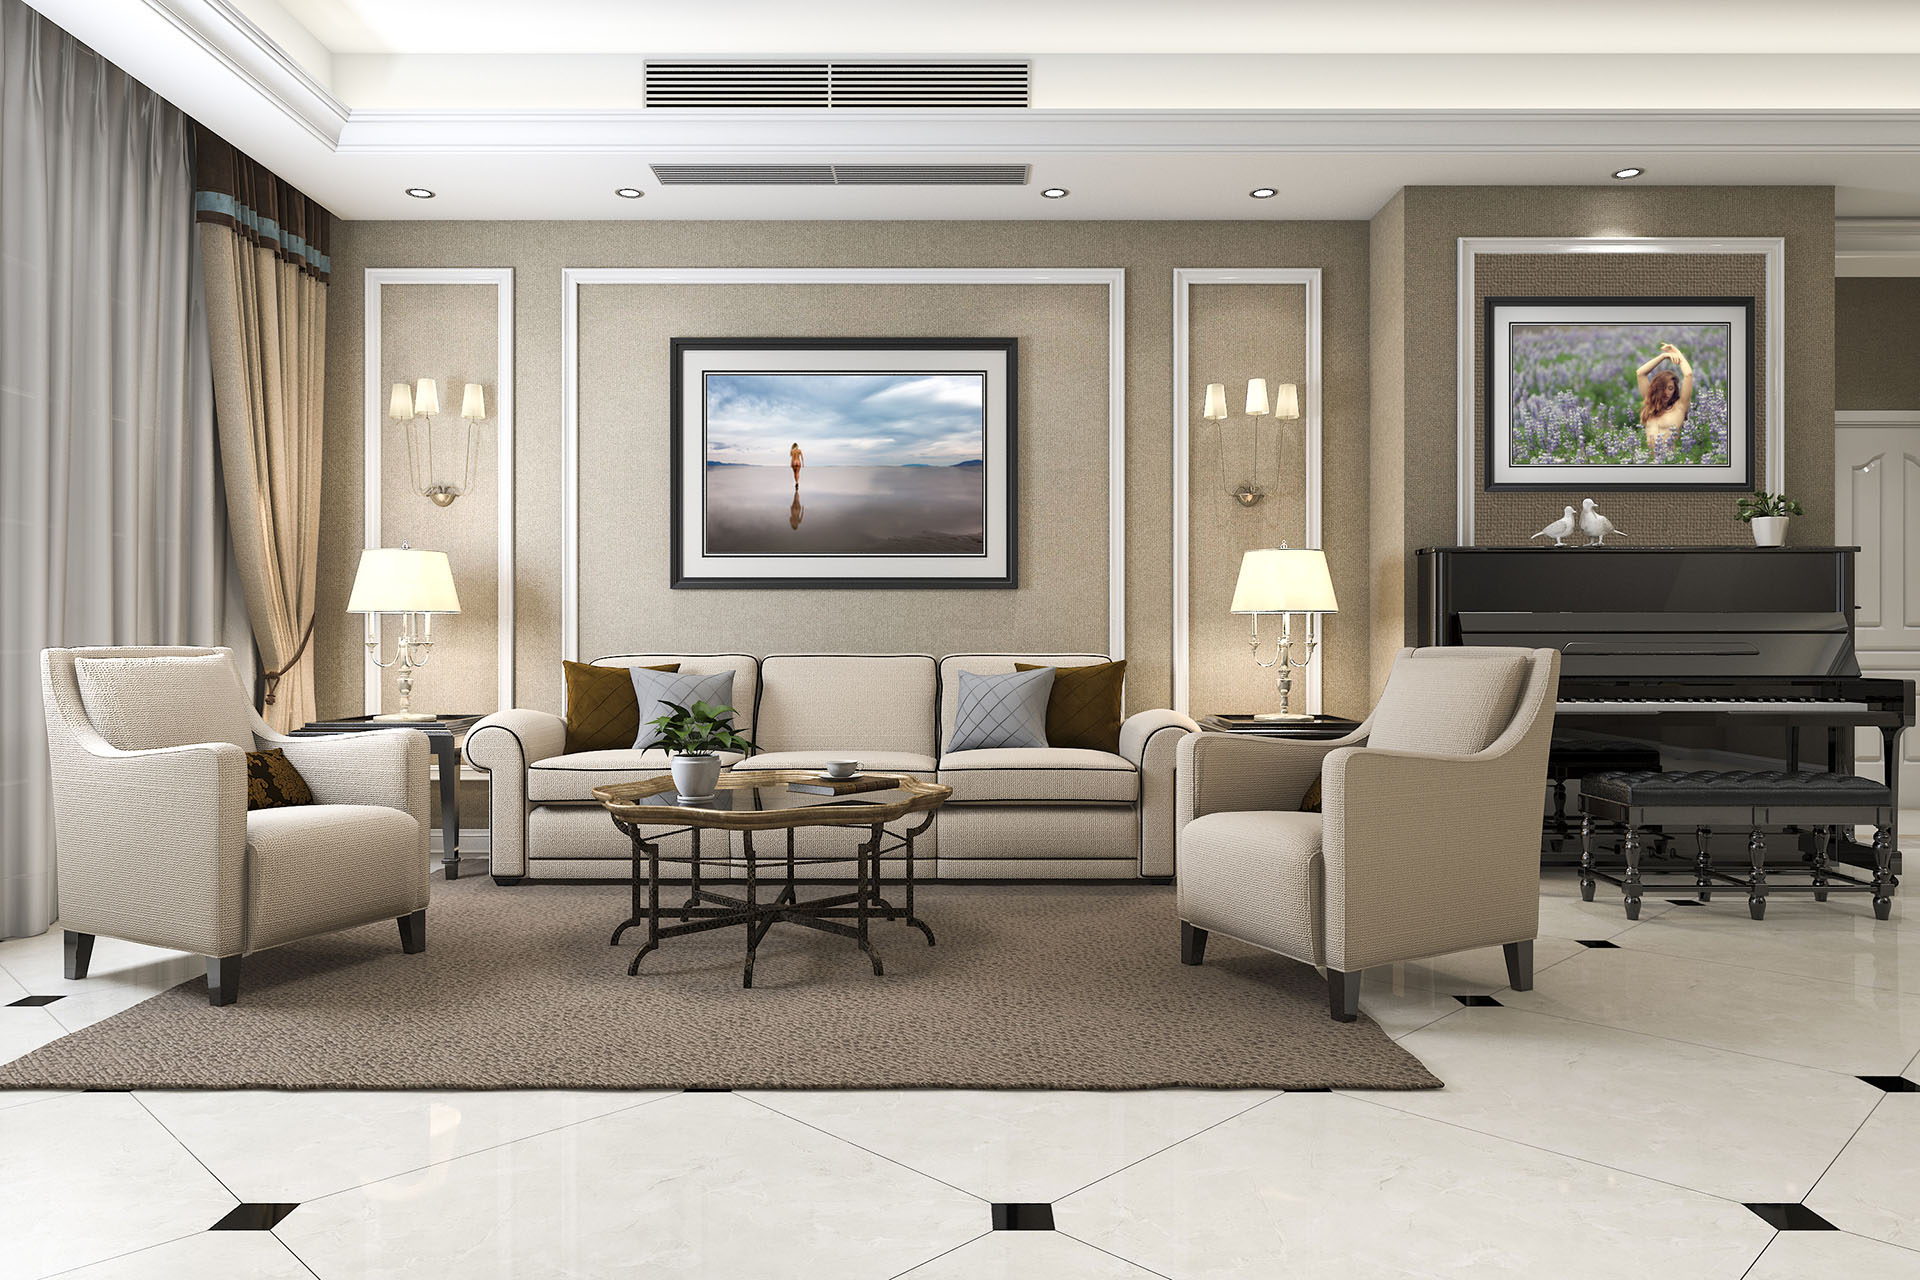 P5317-living-room-wall-art